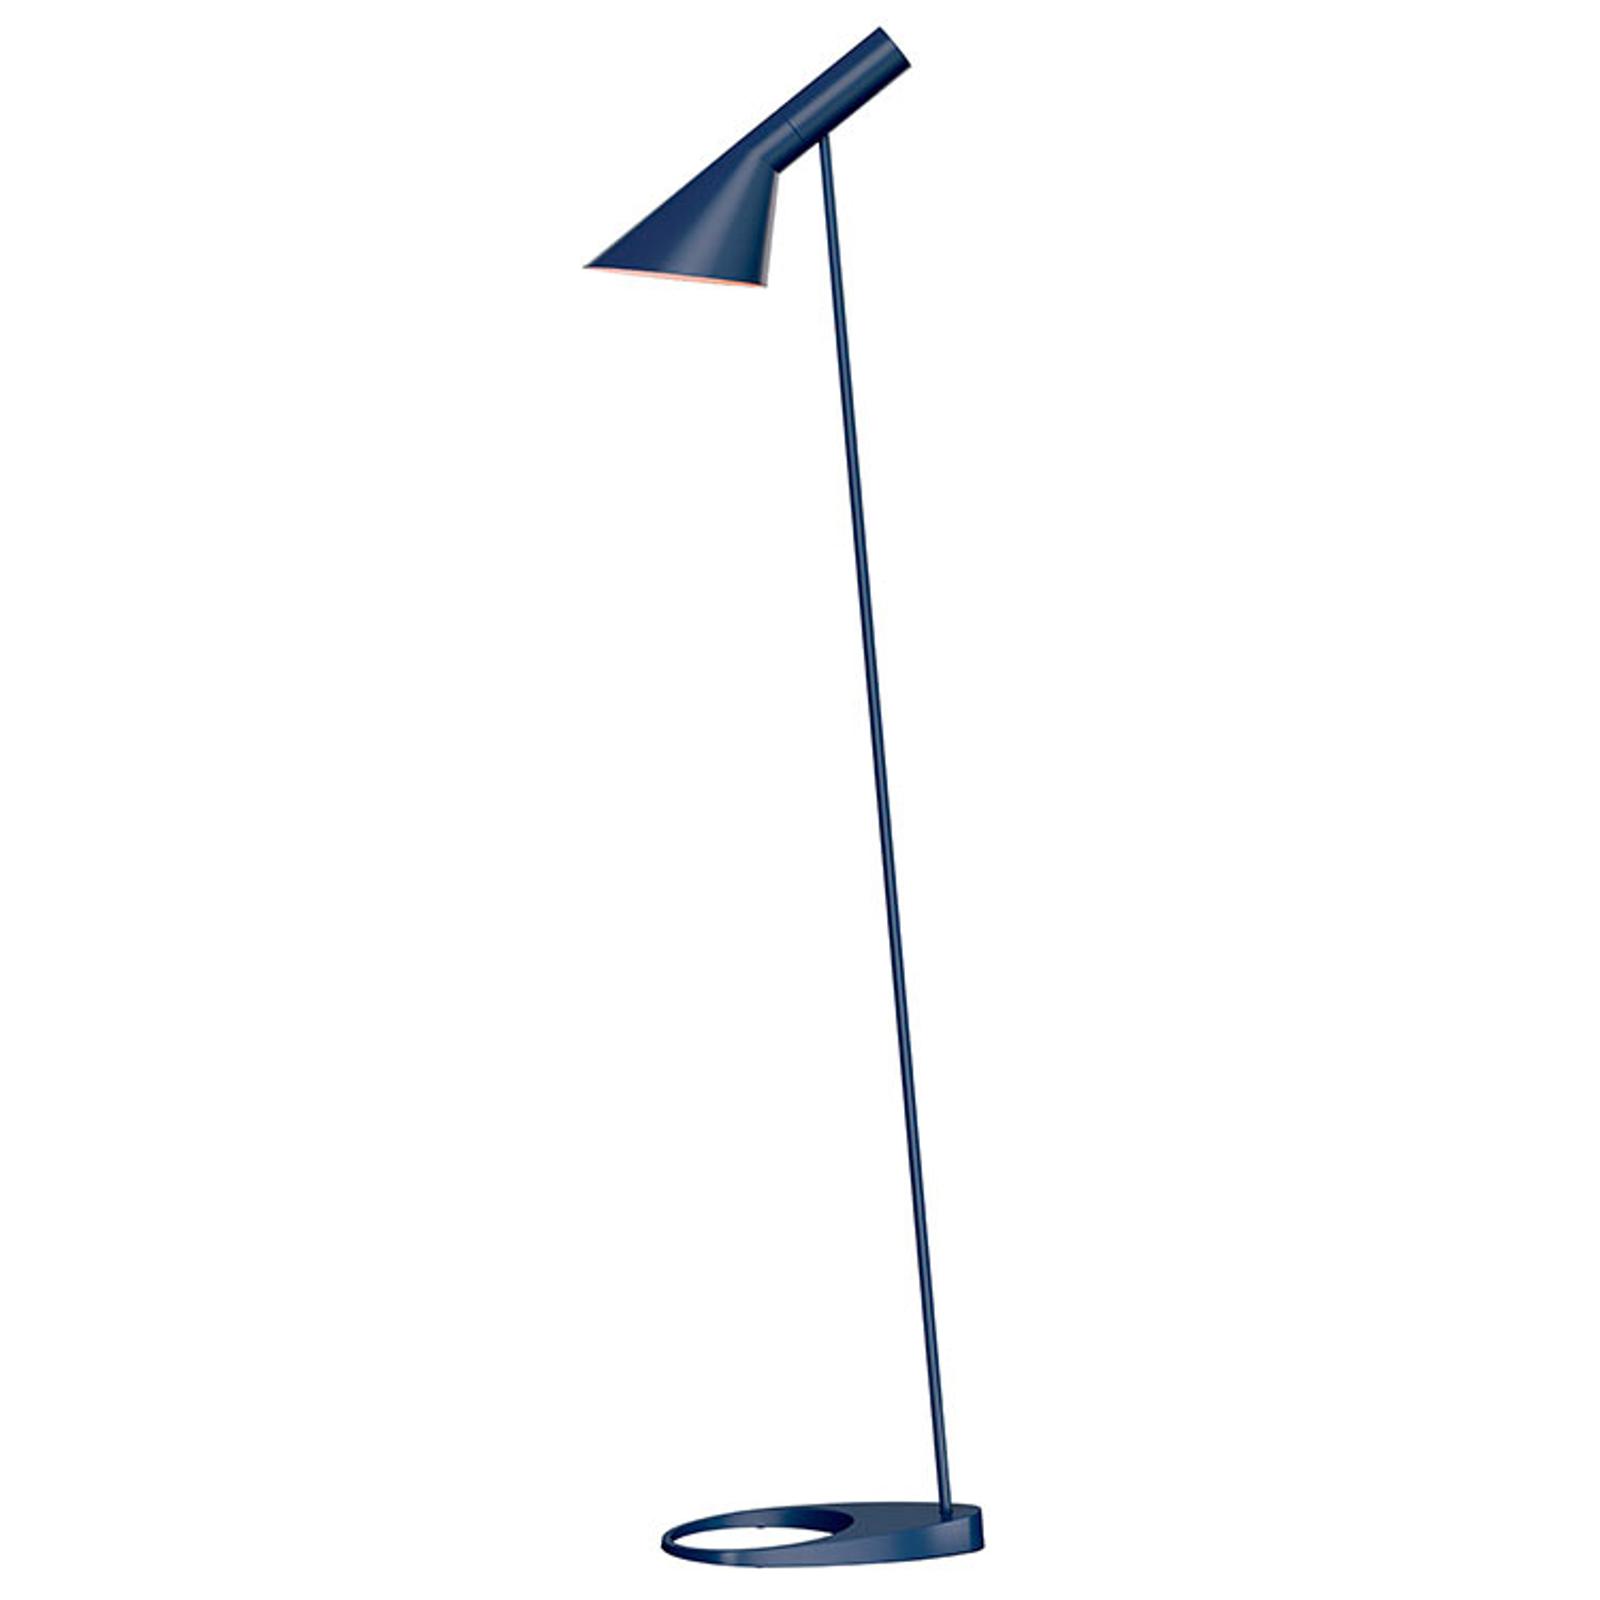 Louis Poulsen AJ - vloerlamp, middernachtblauw